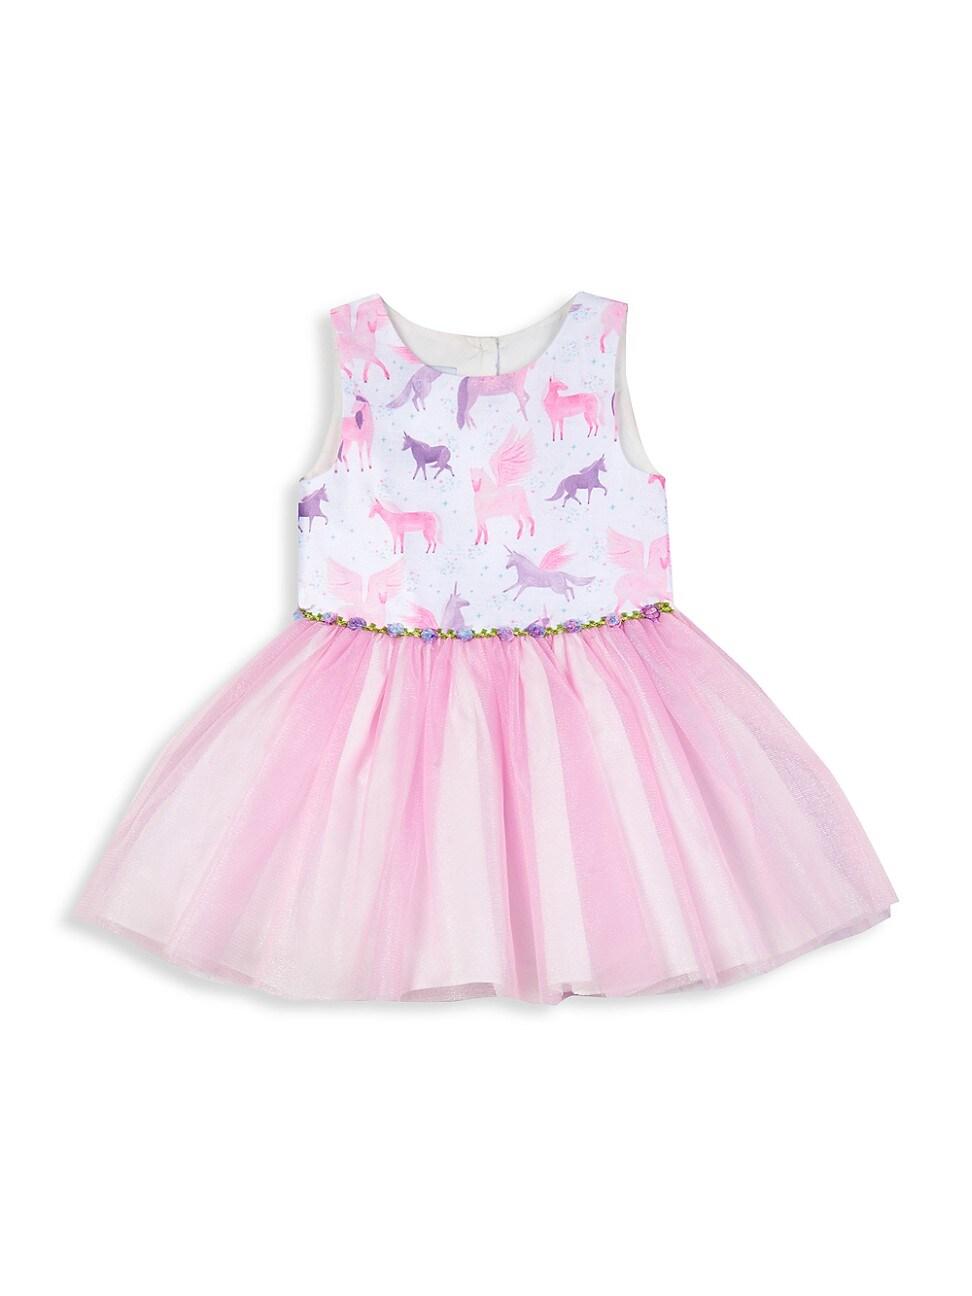 Pippa & Julie Dresses LITTLE GIRL'S AND GIRL'S UNICORN TUTU DRESS